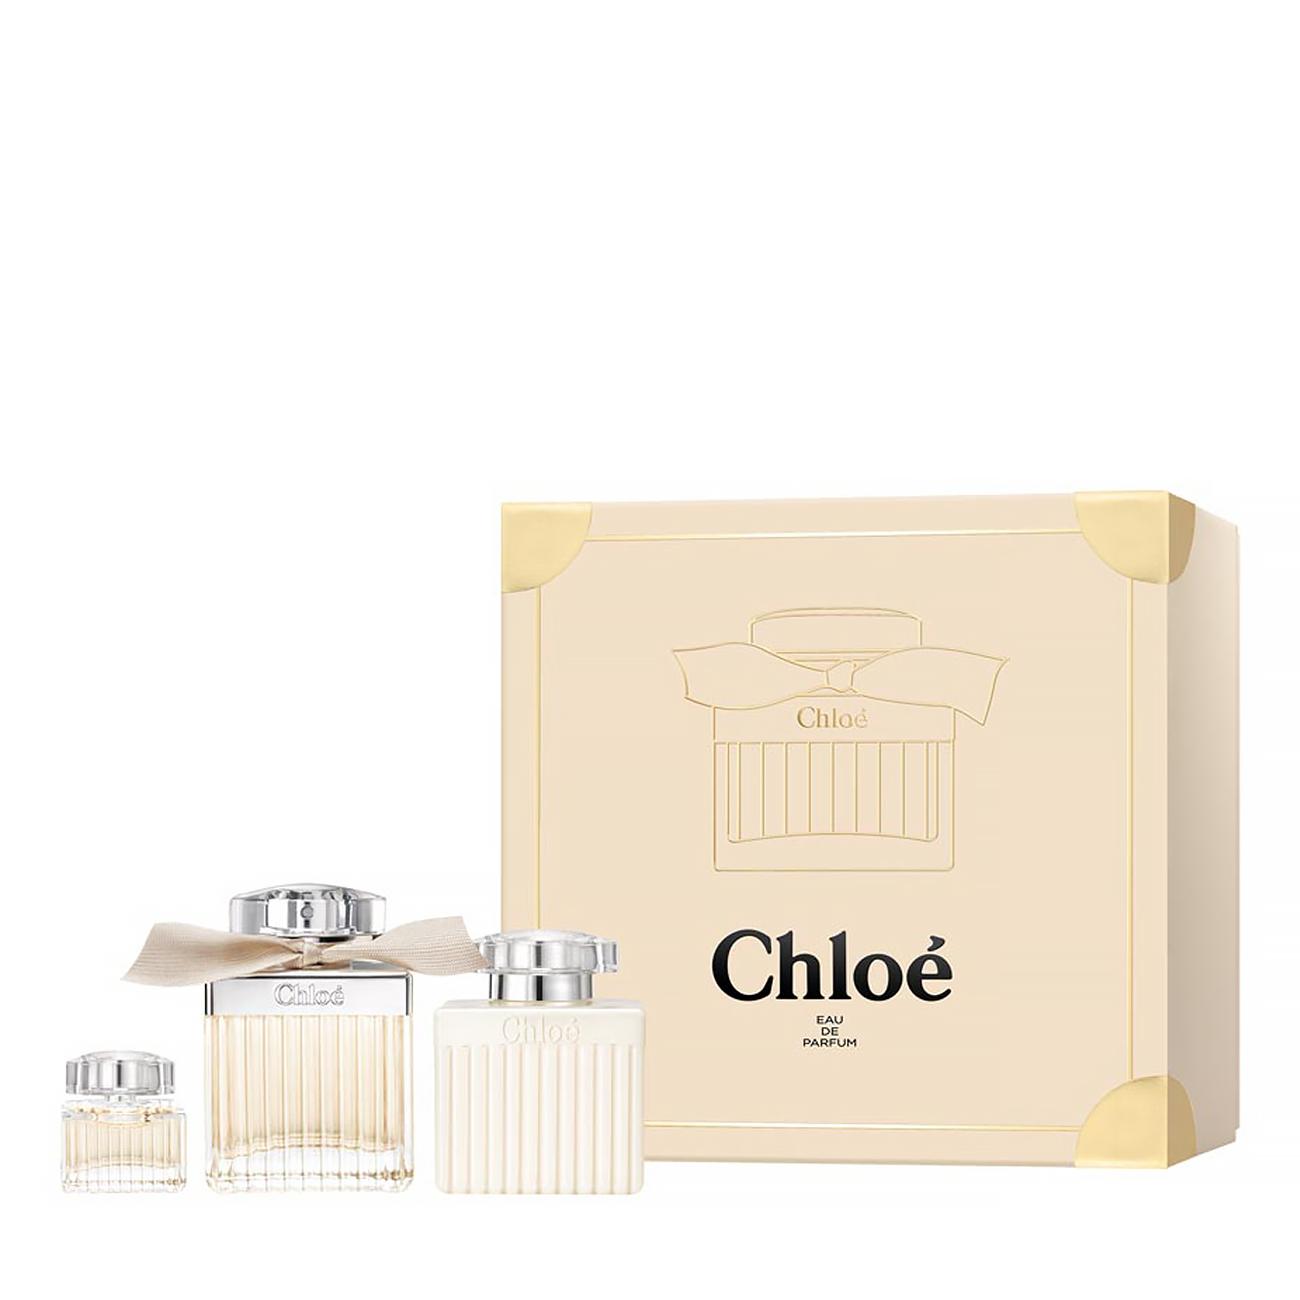 Chloe Set 180ml imagine